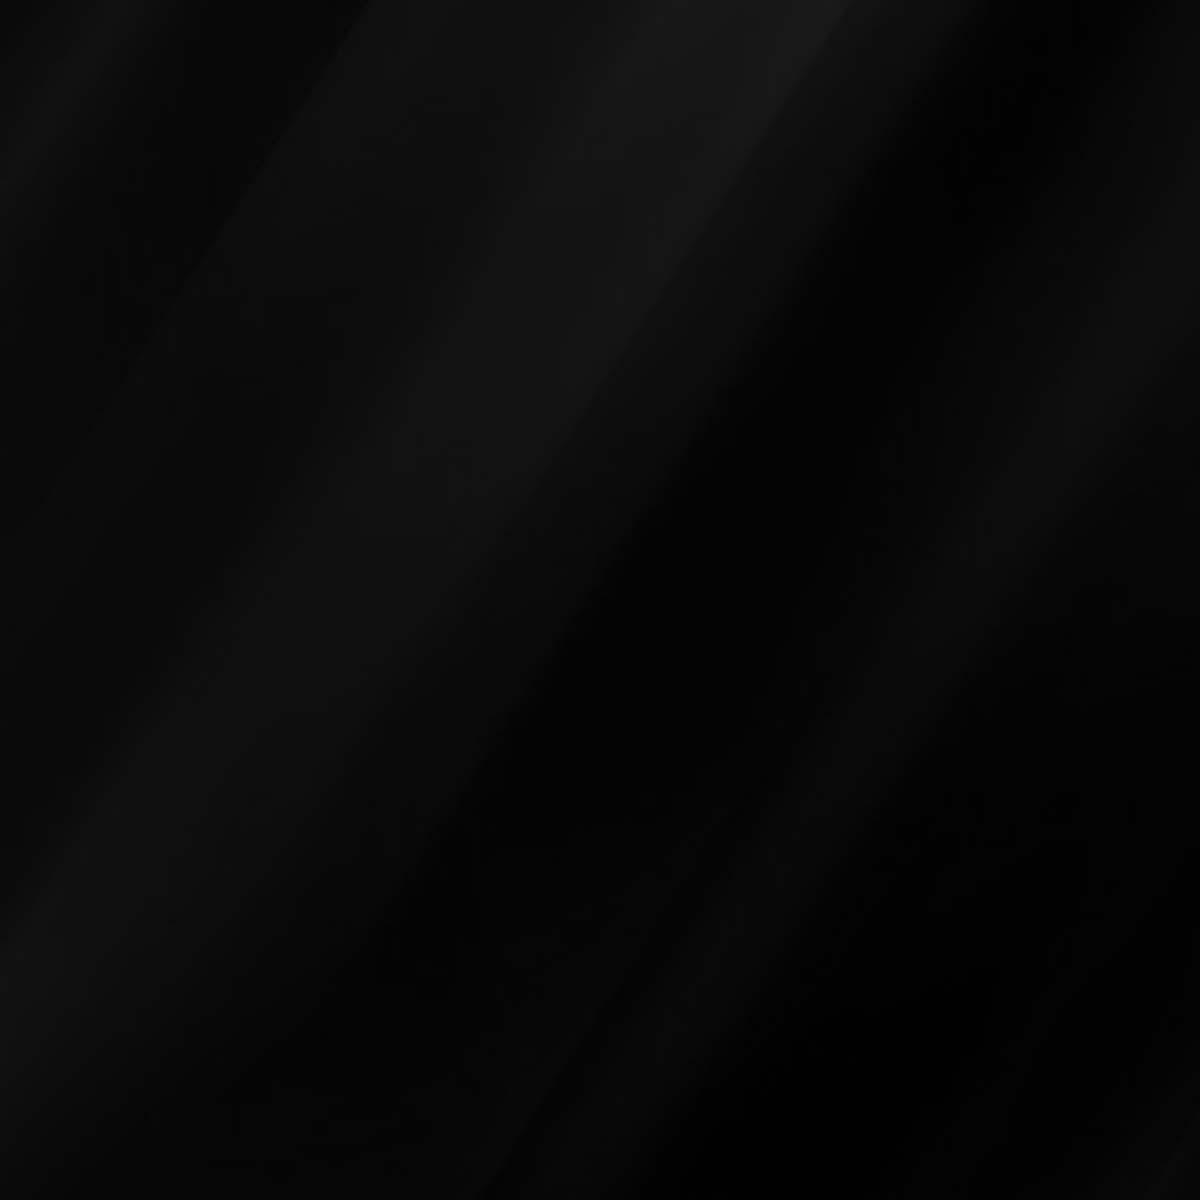 Topquartz-Negro-Absoluto-(Pxqz872)